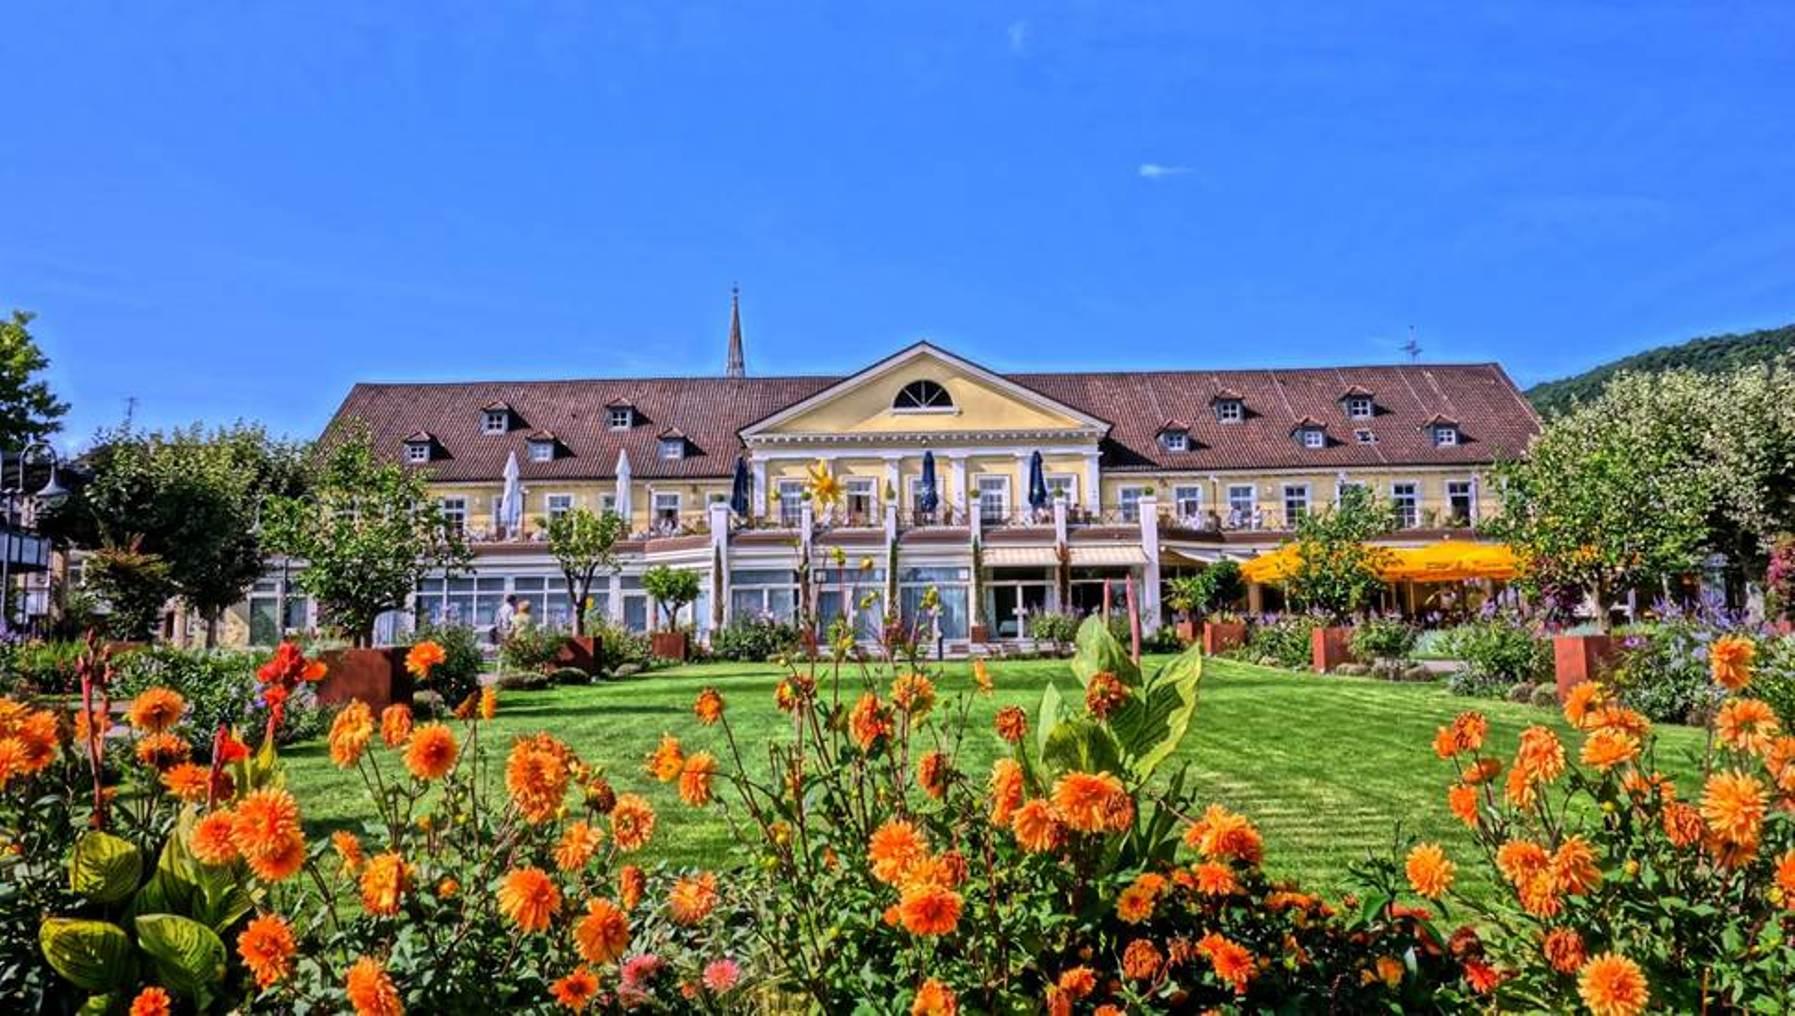 Kurparkhotel Bad DГјrkheim Speisekarte